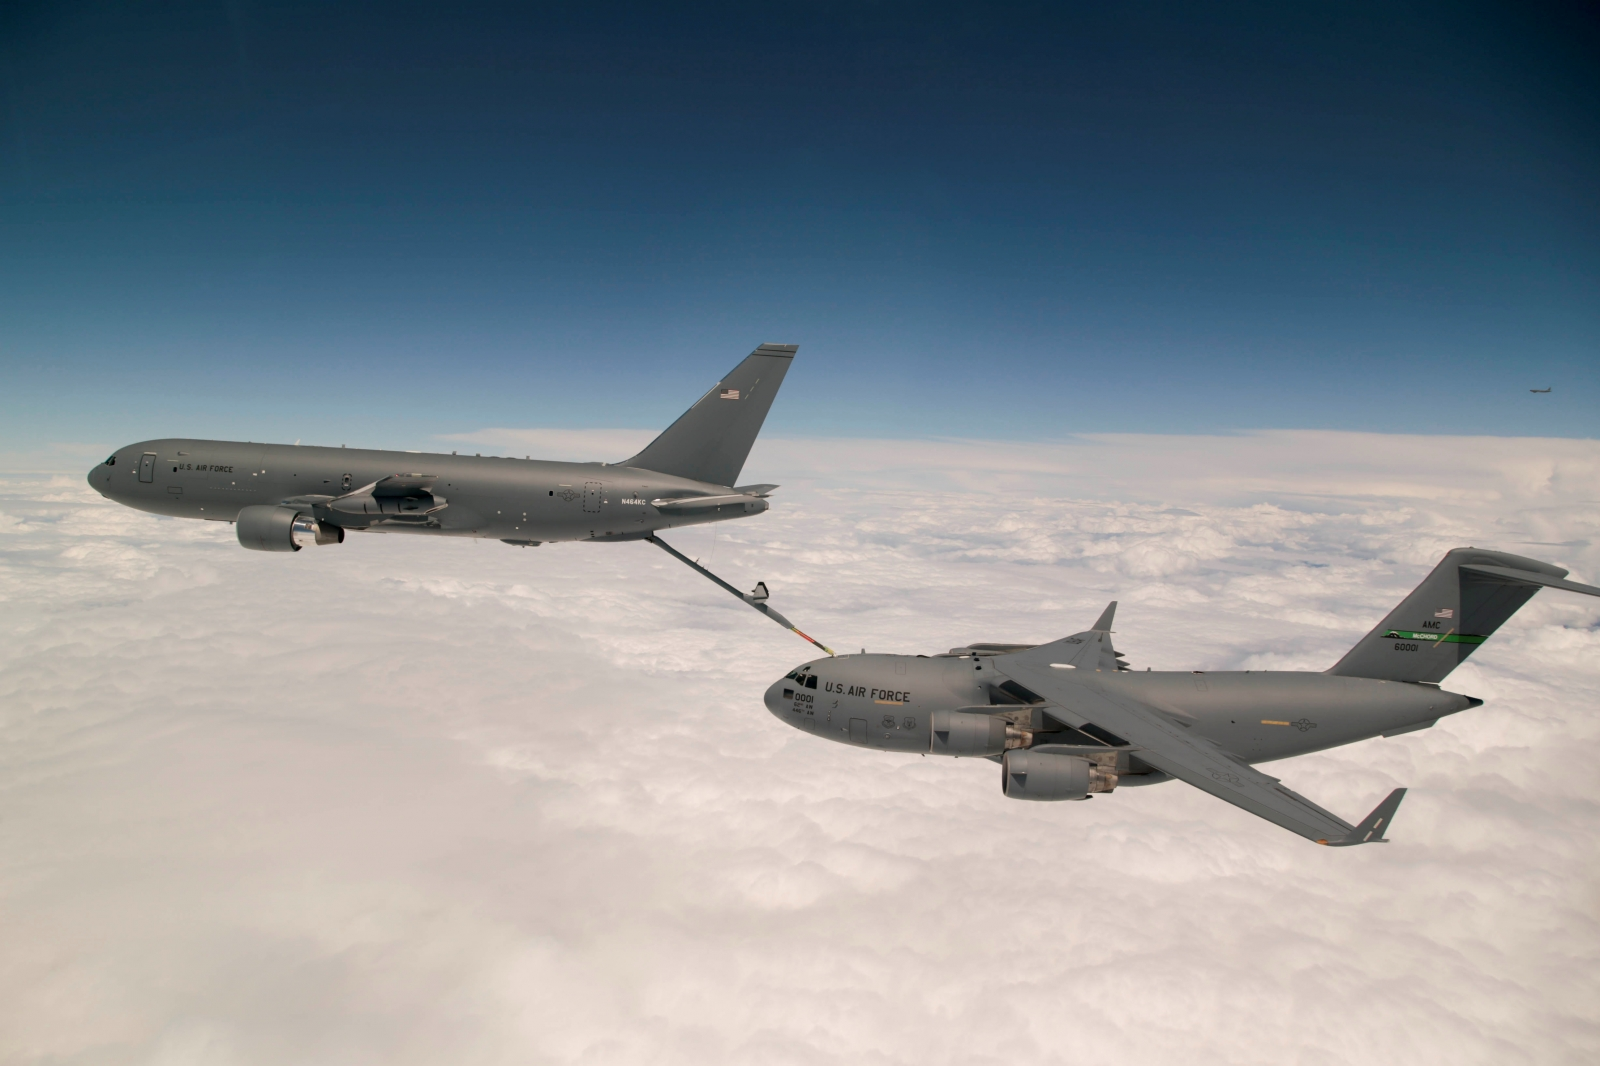 Boeing KC-46 aerial tanker